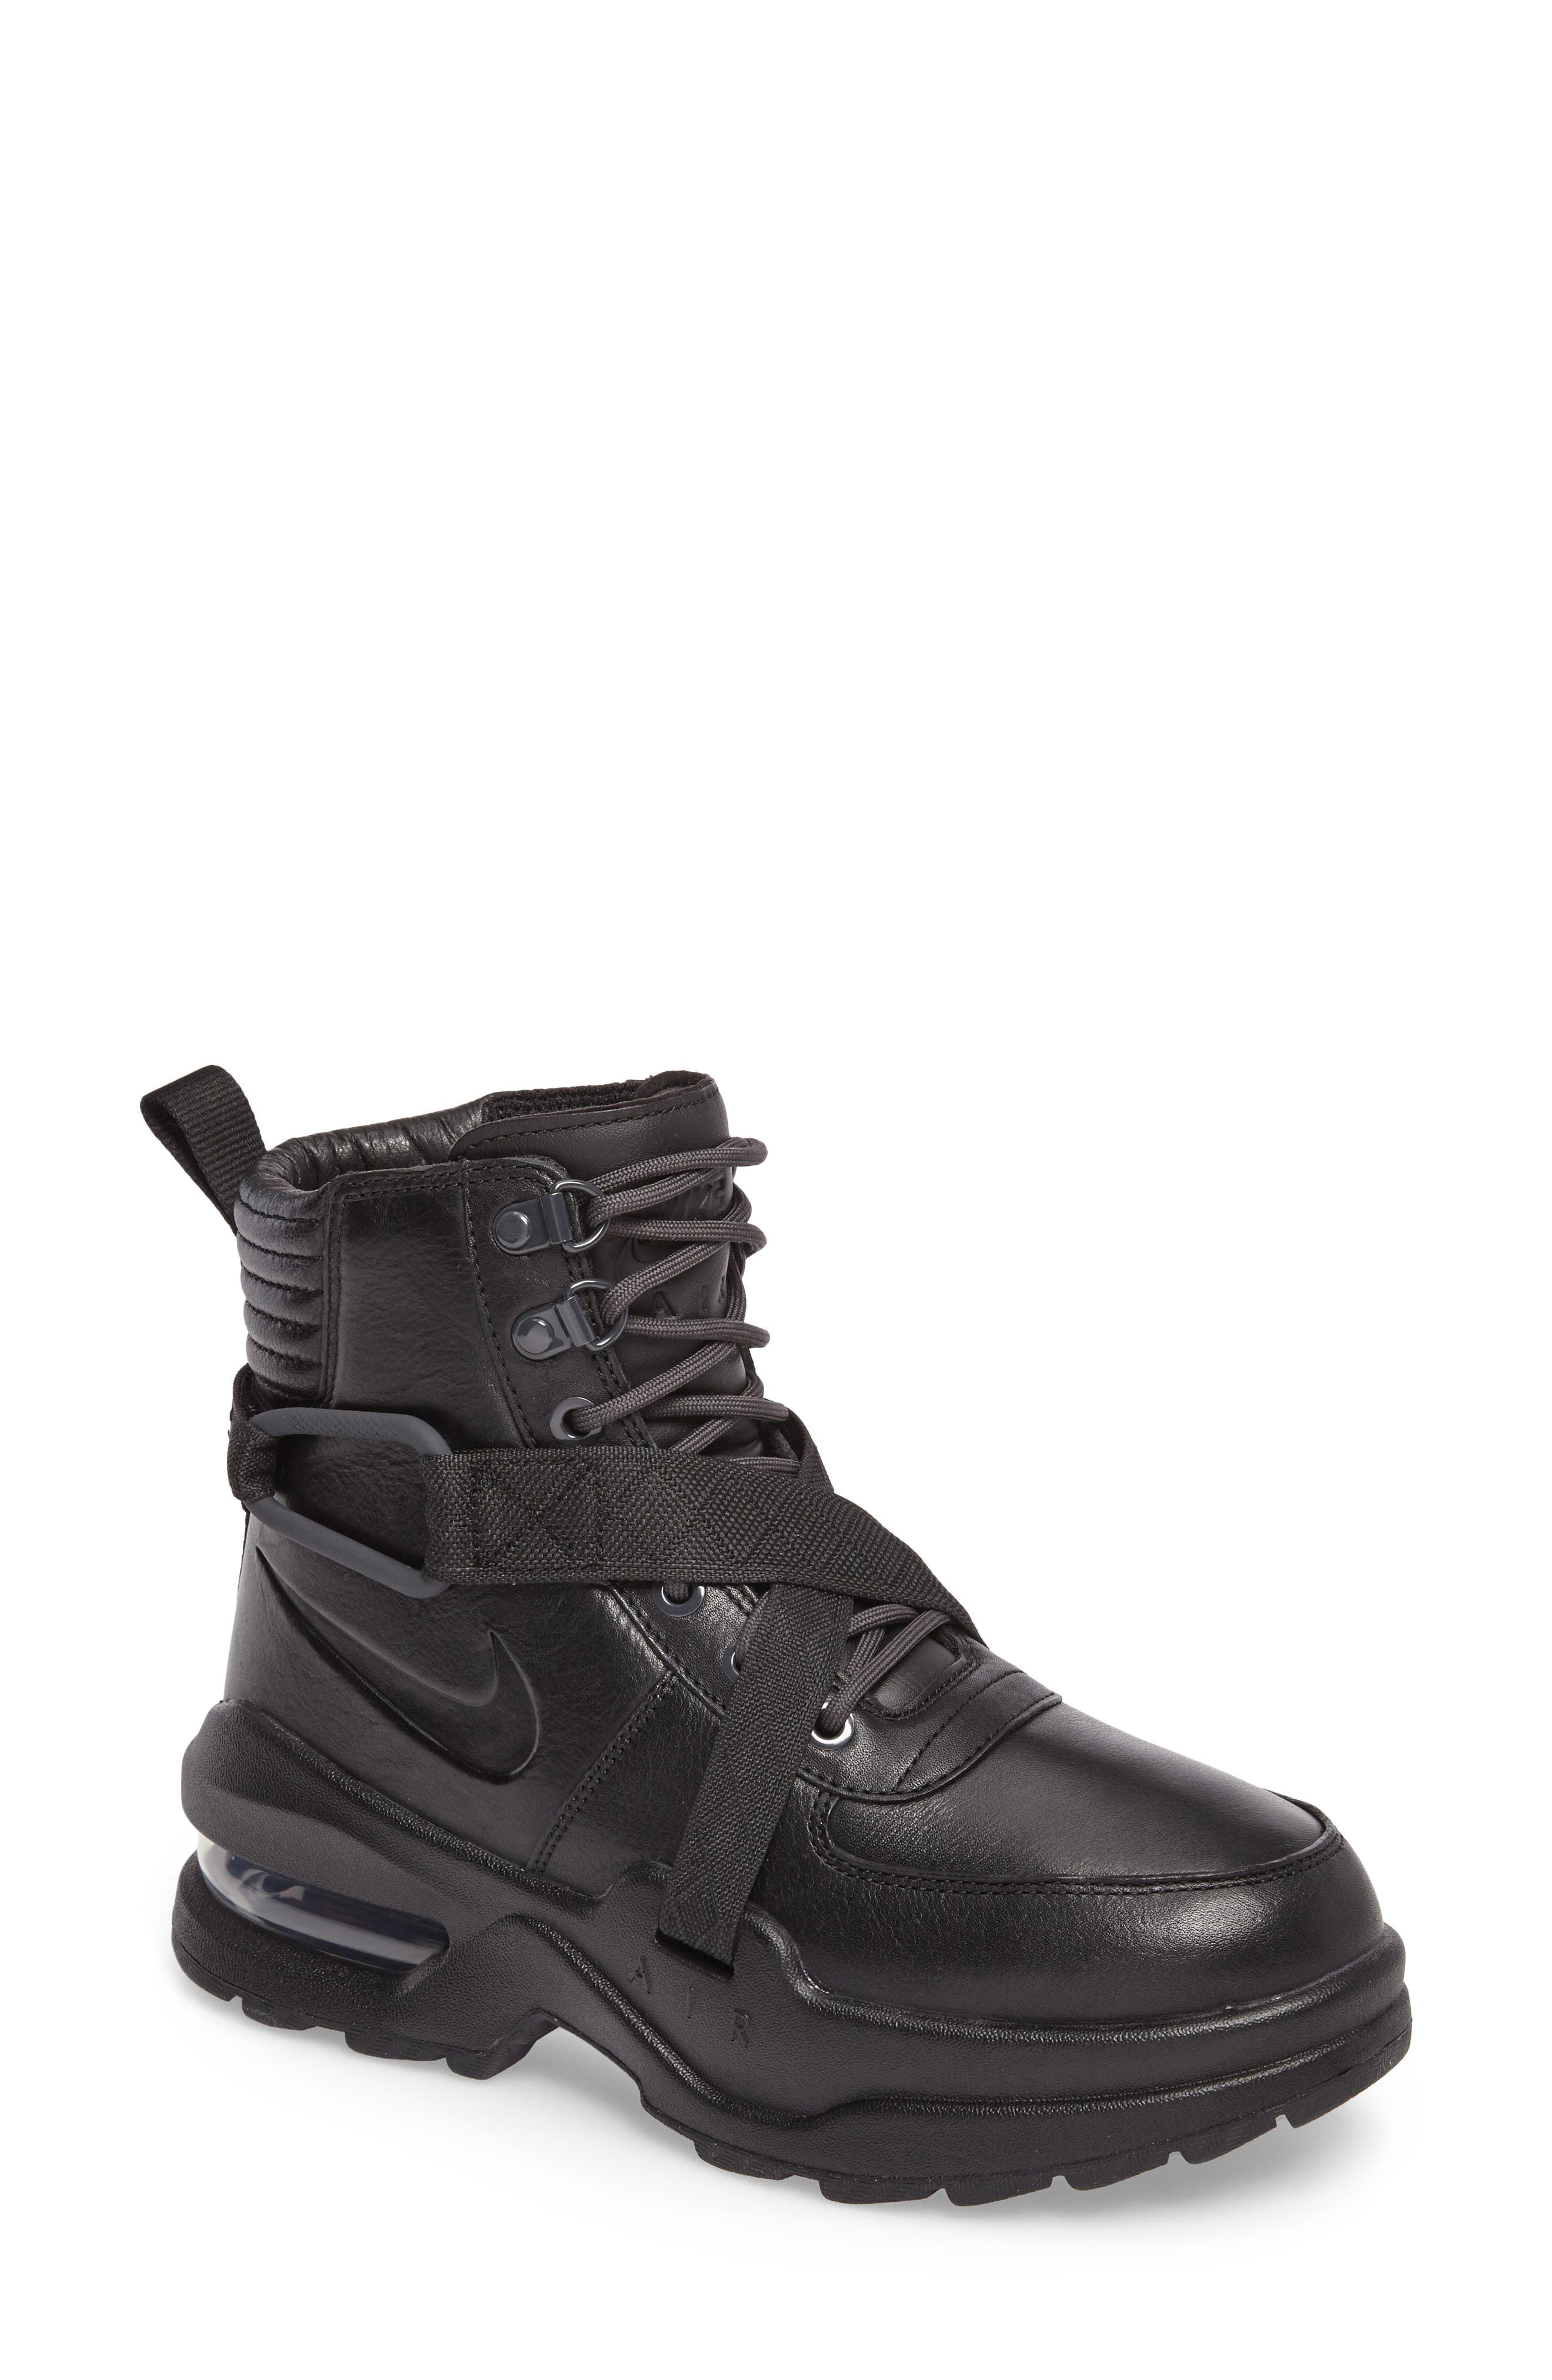 Nike Air Max Goadome Sneaker Boot (Women)